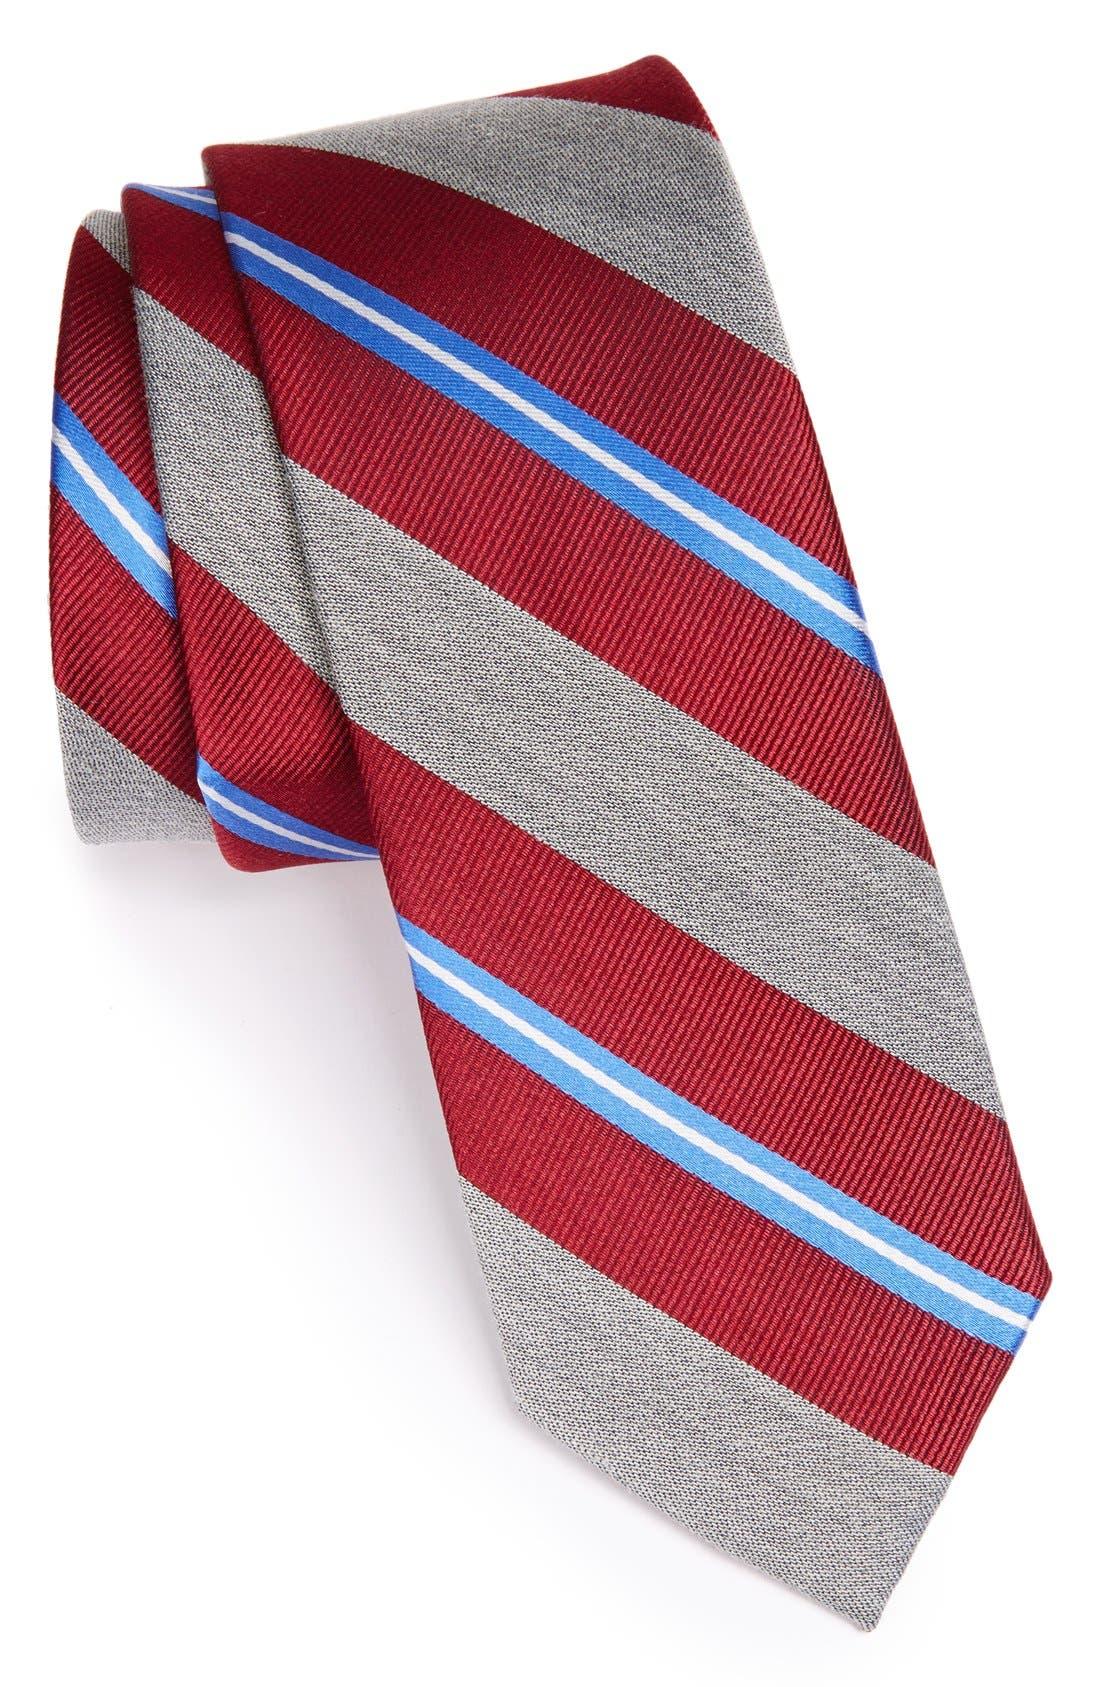 Alternate Image 1 Selected - 1901 'Brady' Woven Silk Blend Tie